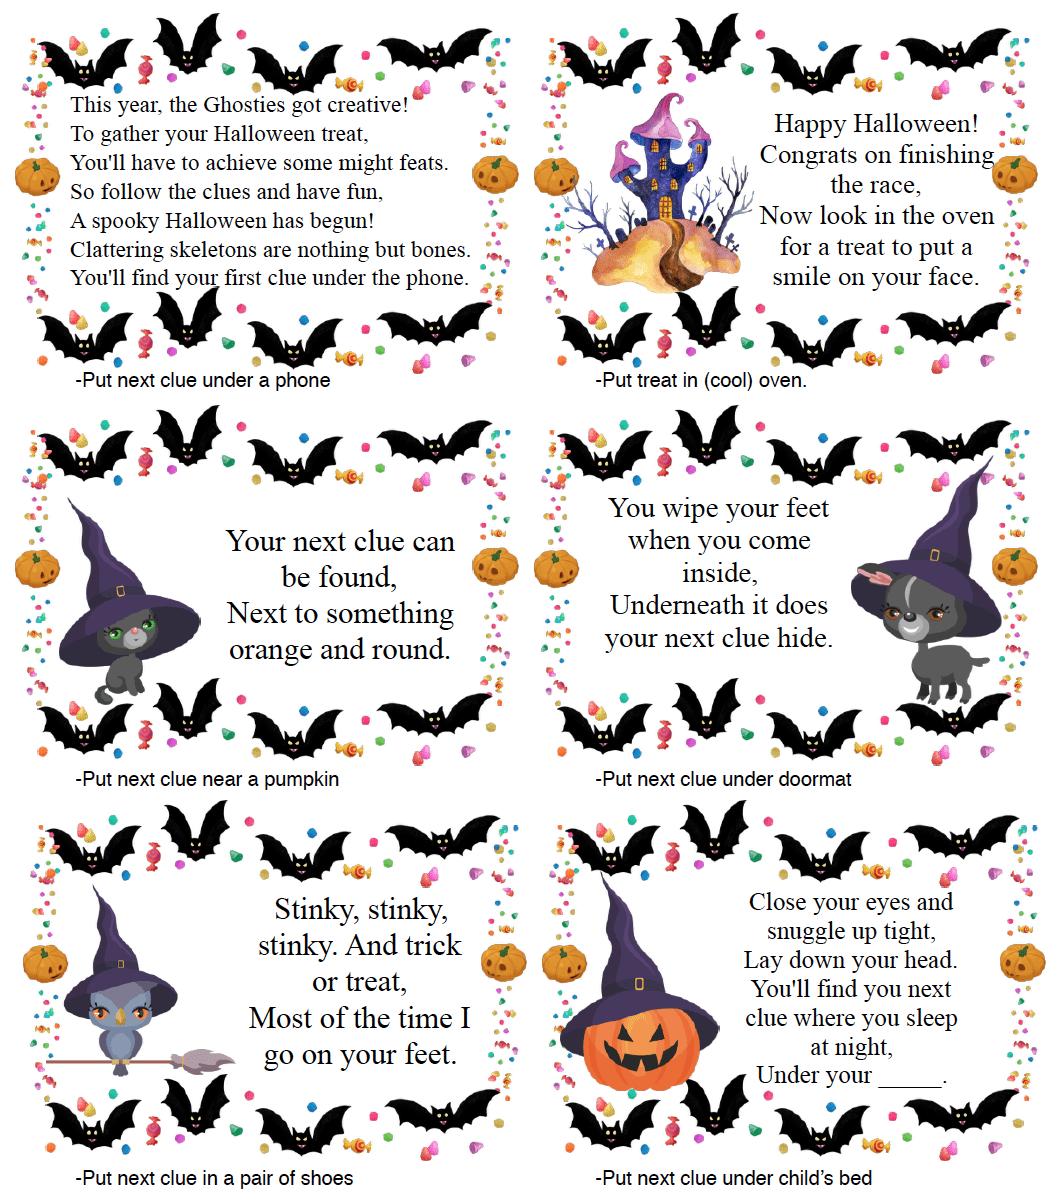 Free Printable Halloween Treasure Hunt For Kids: 24 Clues